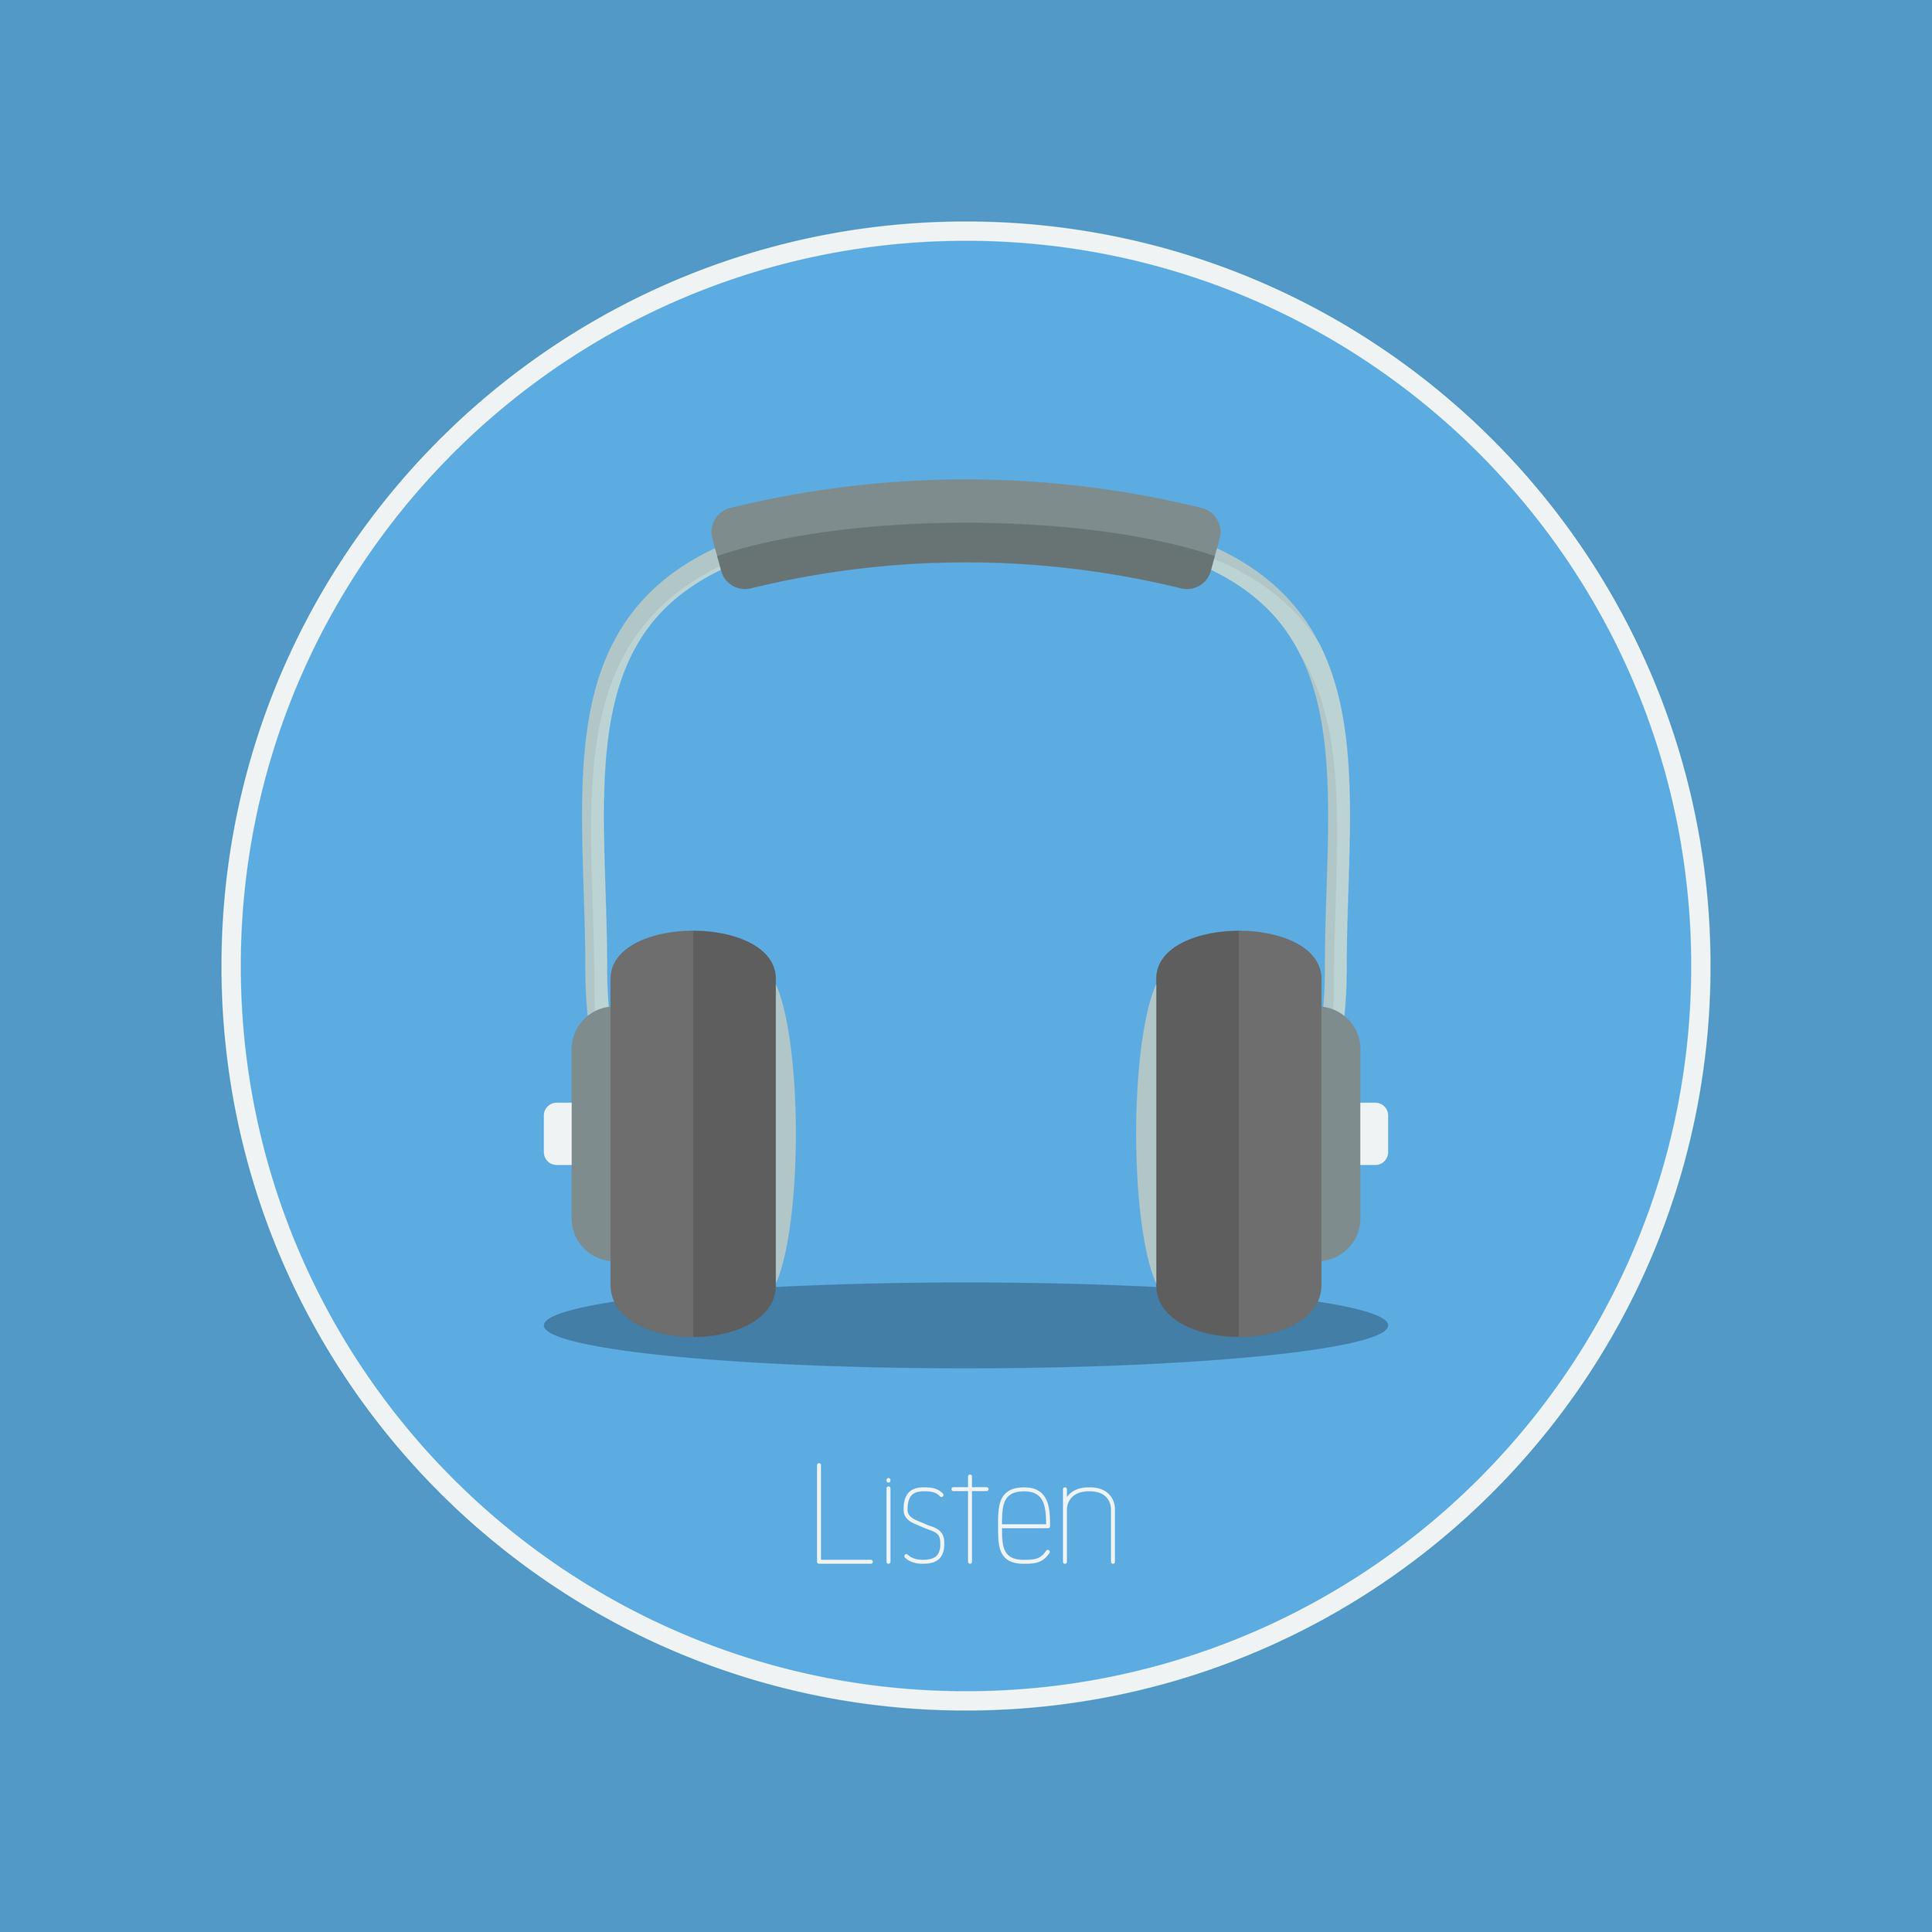 MORE GREAT RADIO